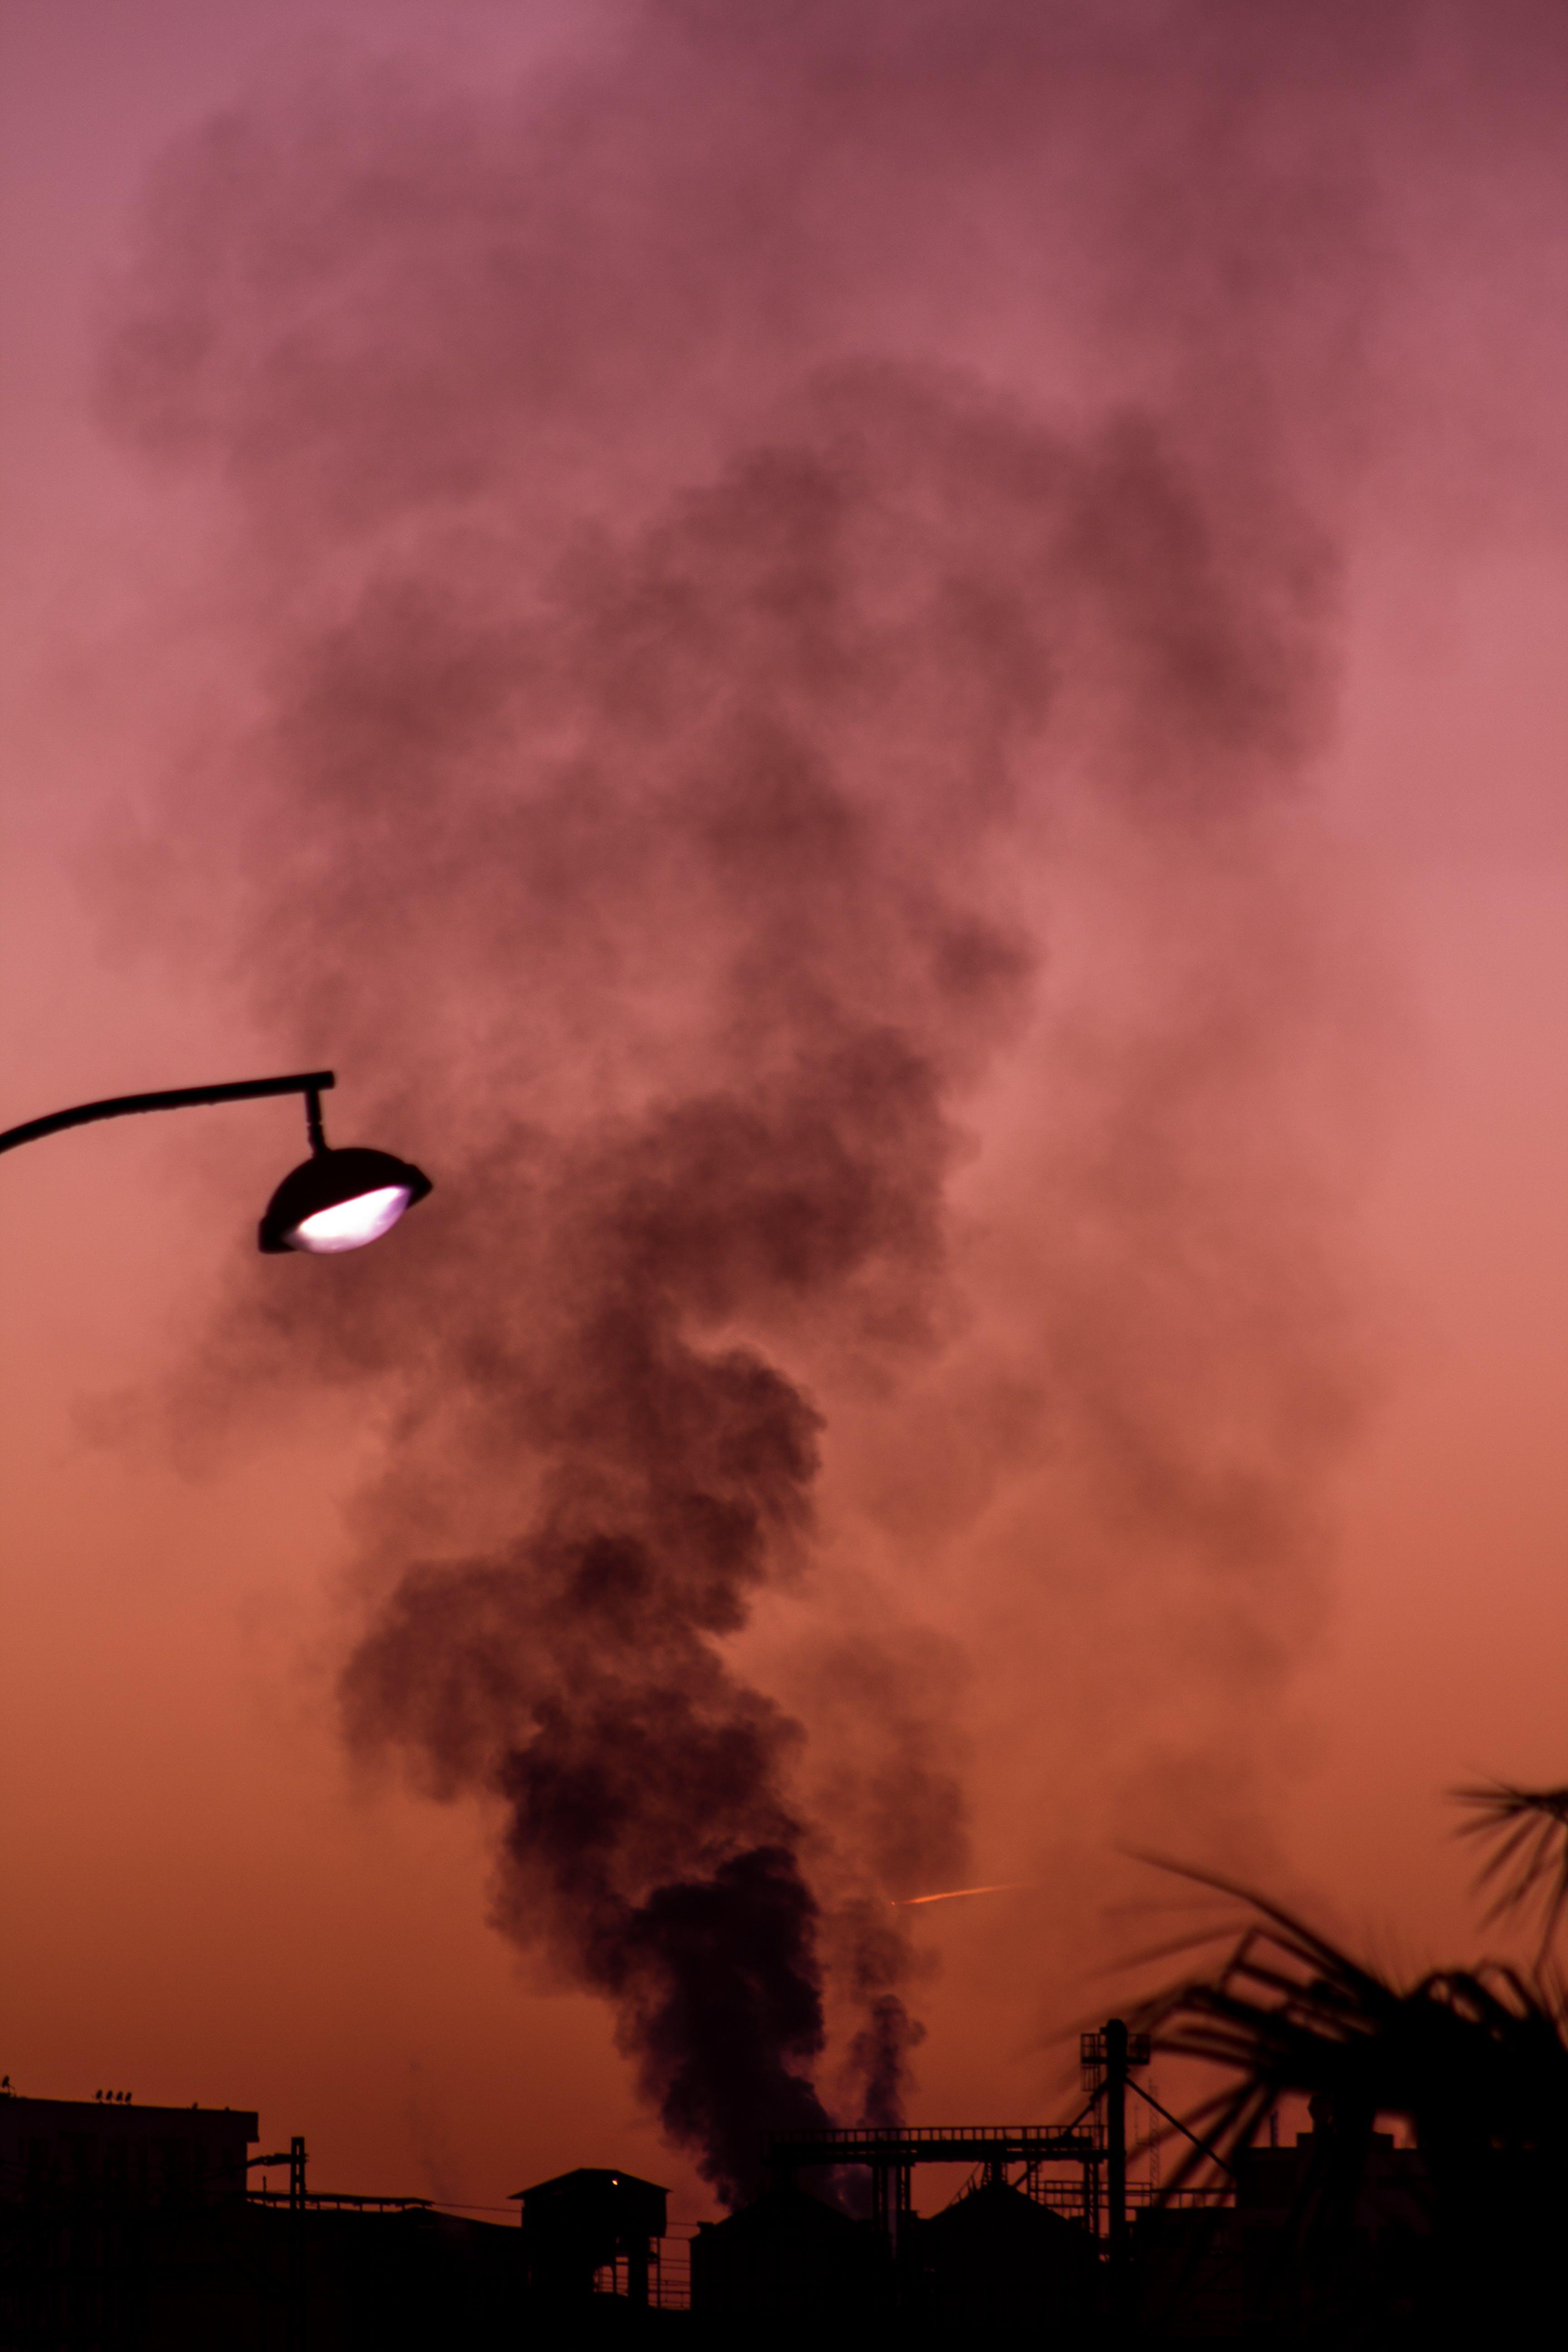 fabrik, fabrikker, forurening